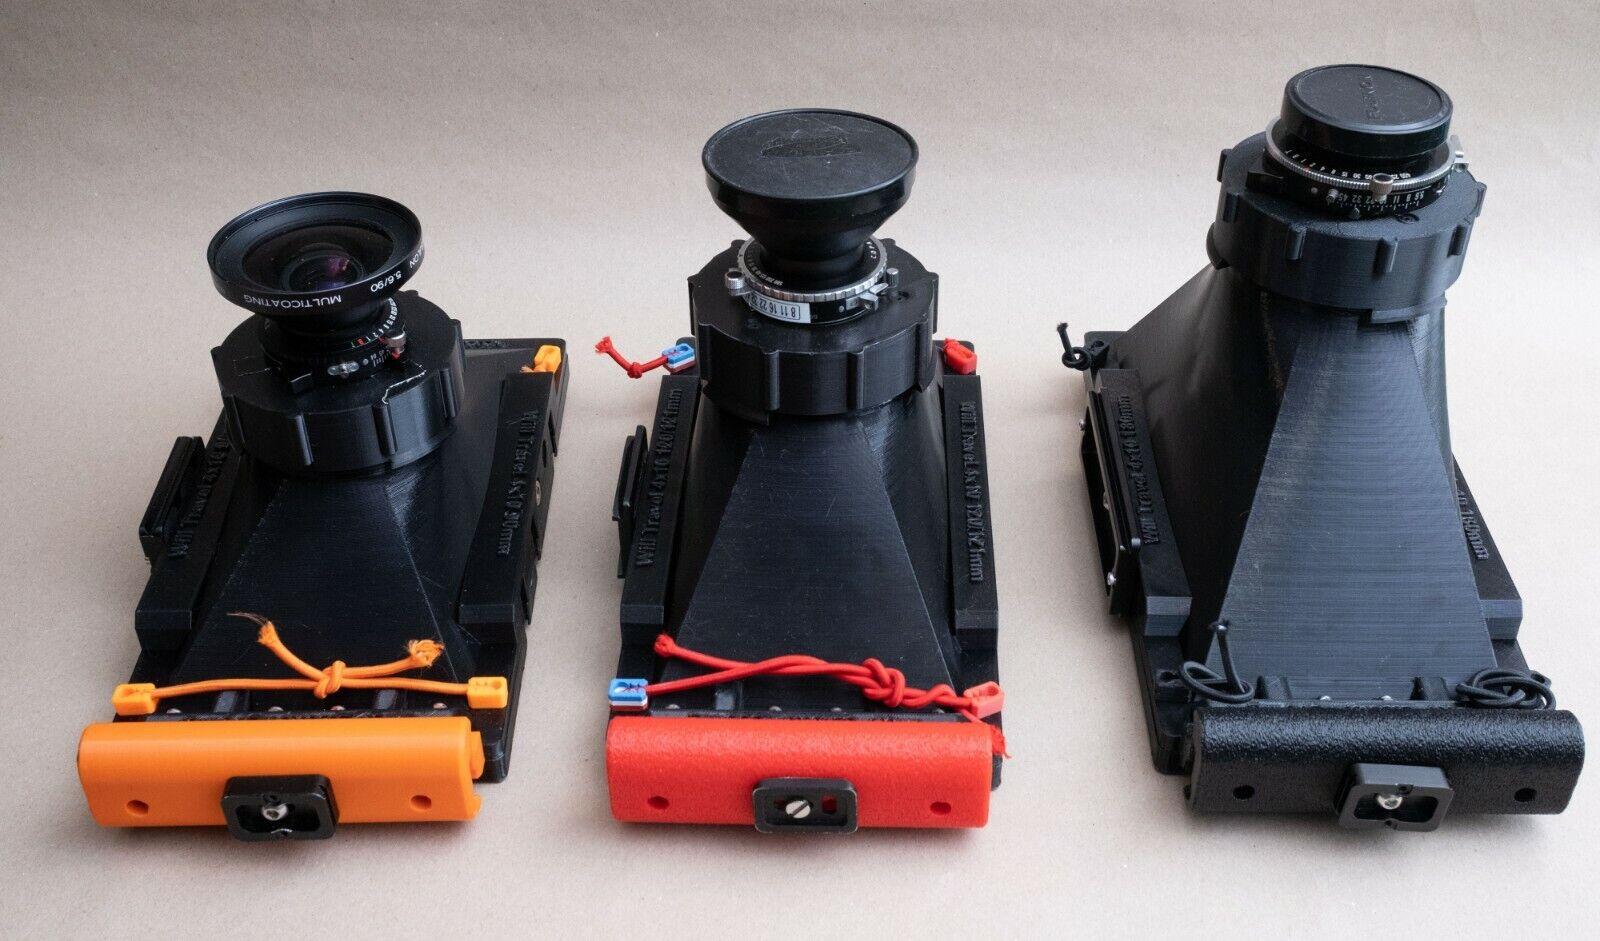 как выглядит 3d printed - WillTravel 4x10 camera for your focal length фото